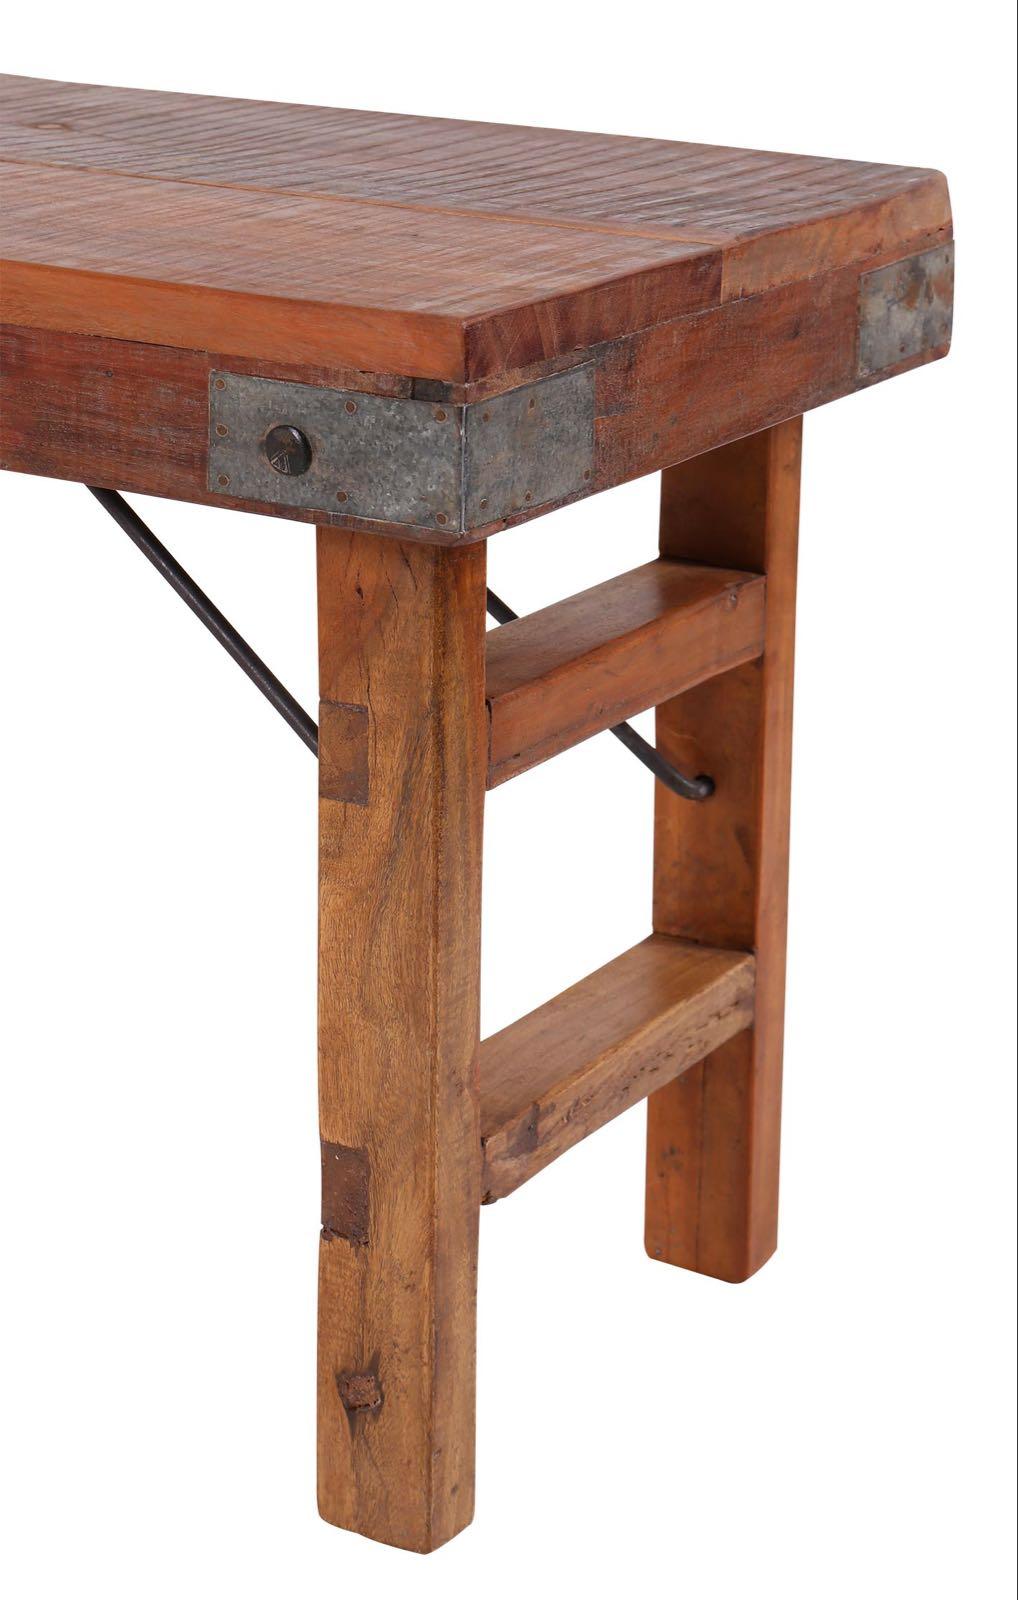 Square Folding Dining Table